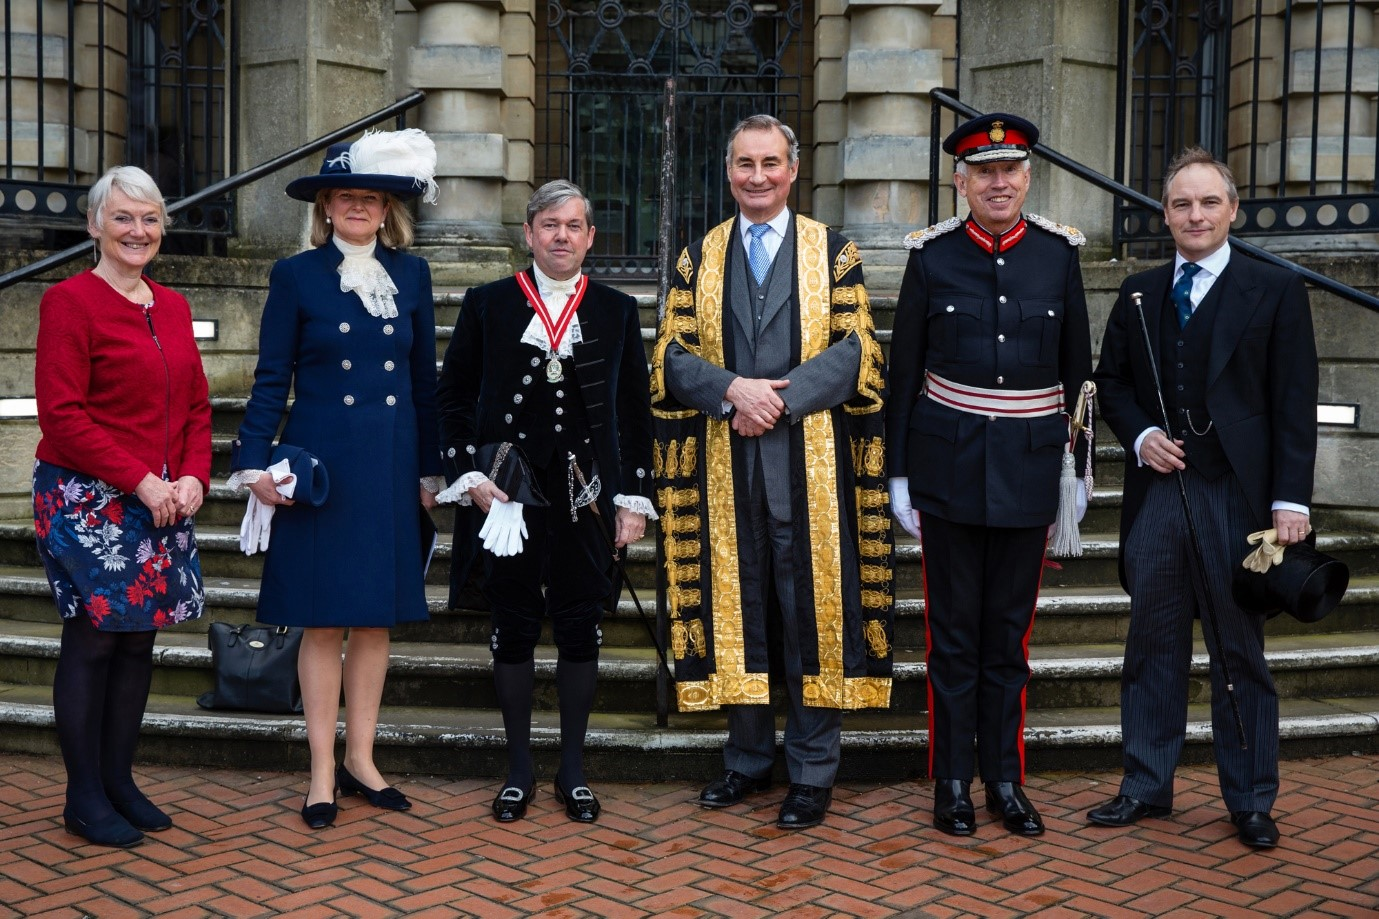 Elizabeth Harrison(Berkshire Bench),Sarah Scrope(outgoing HS),Graham Barker(incoming HS), Lord Hughes, James Puxley (Lord Lieutenant), Jonathan Gater (Under Sheriff)